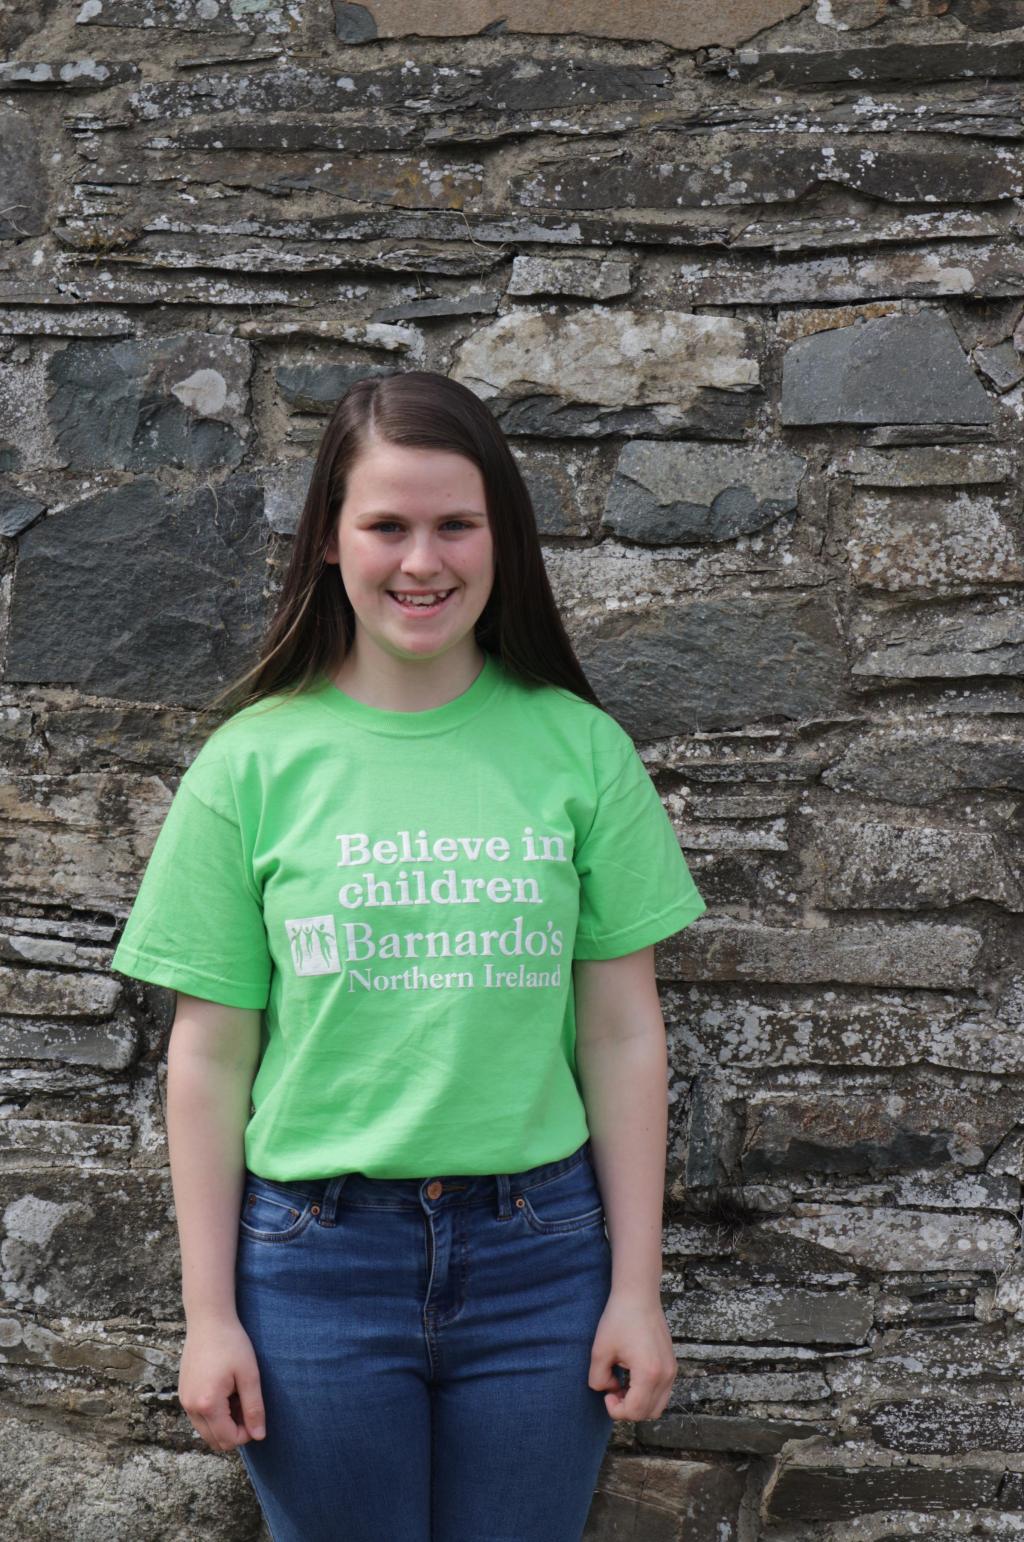 Lauren, 15 year old Fundraiser